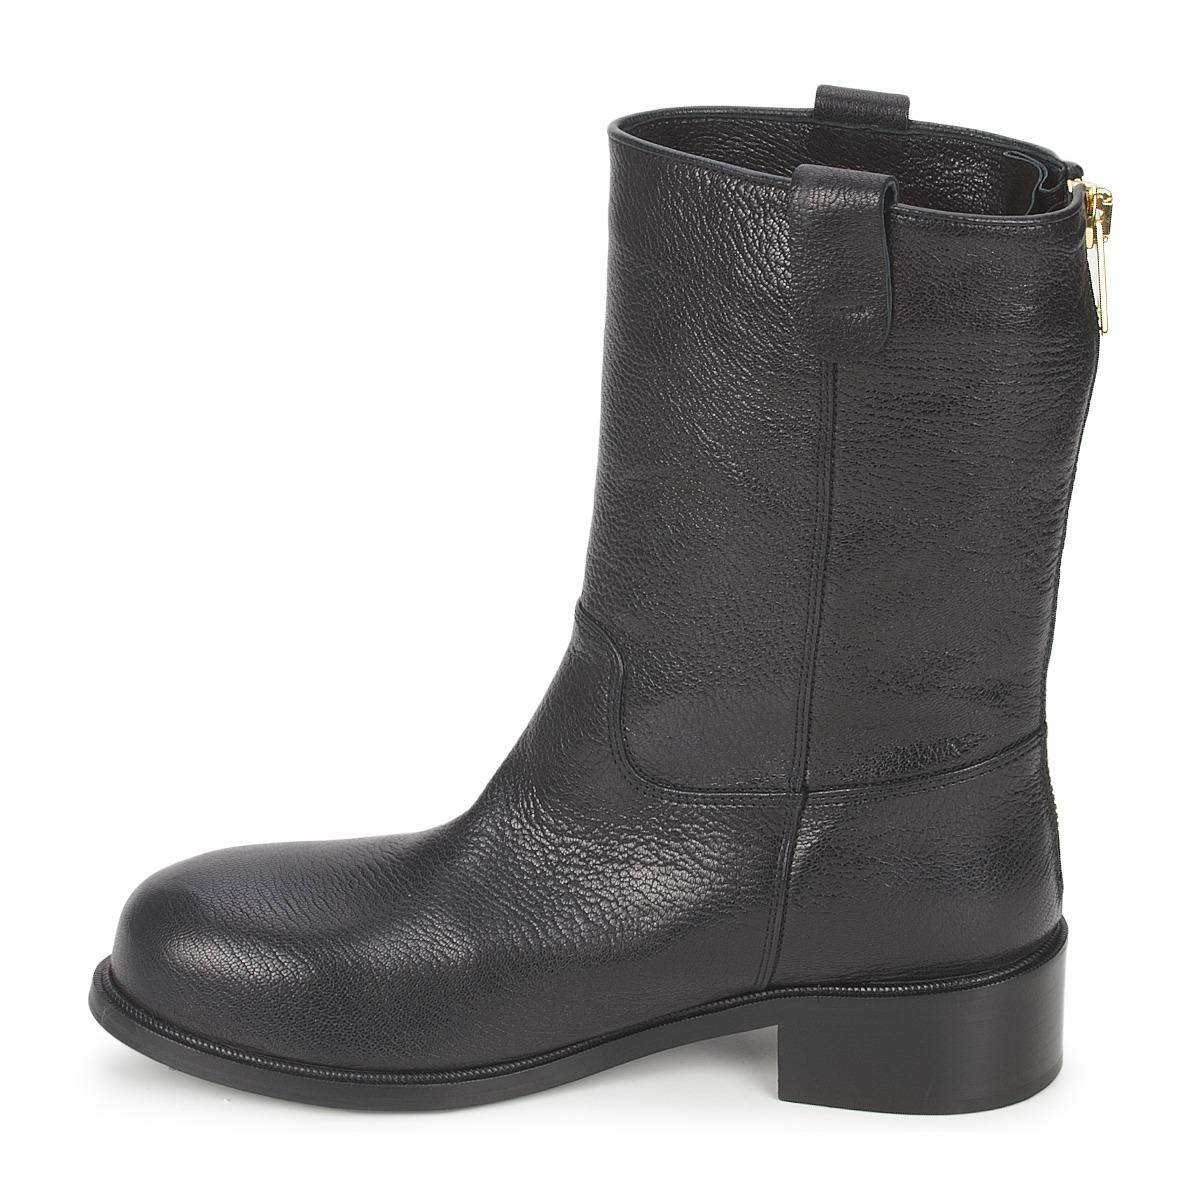 Kalliste 5715 Women's High Boots In Black